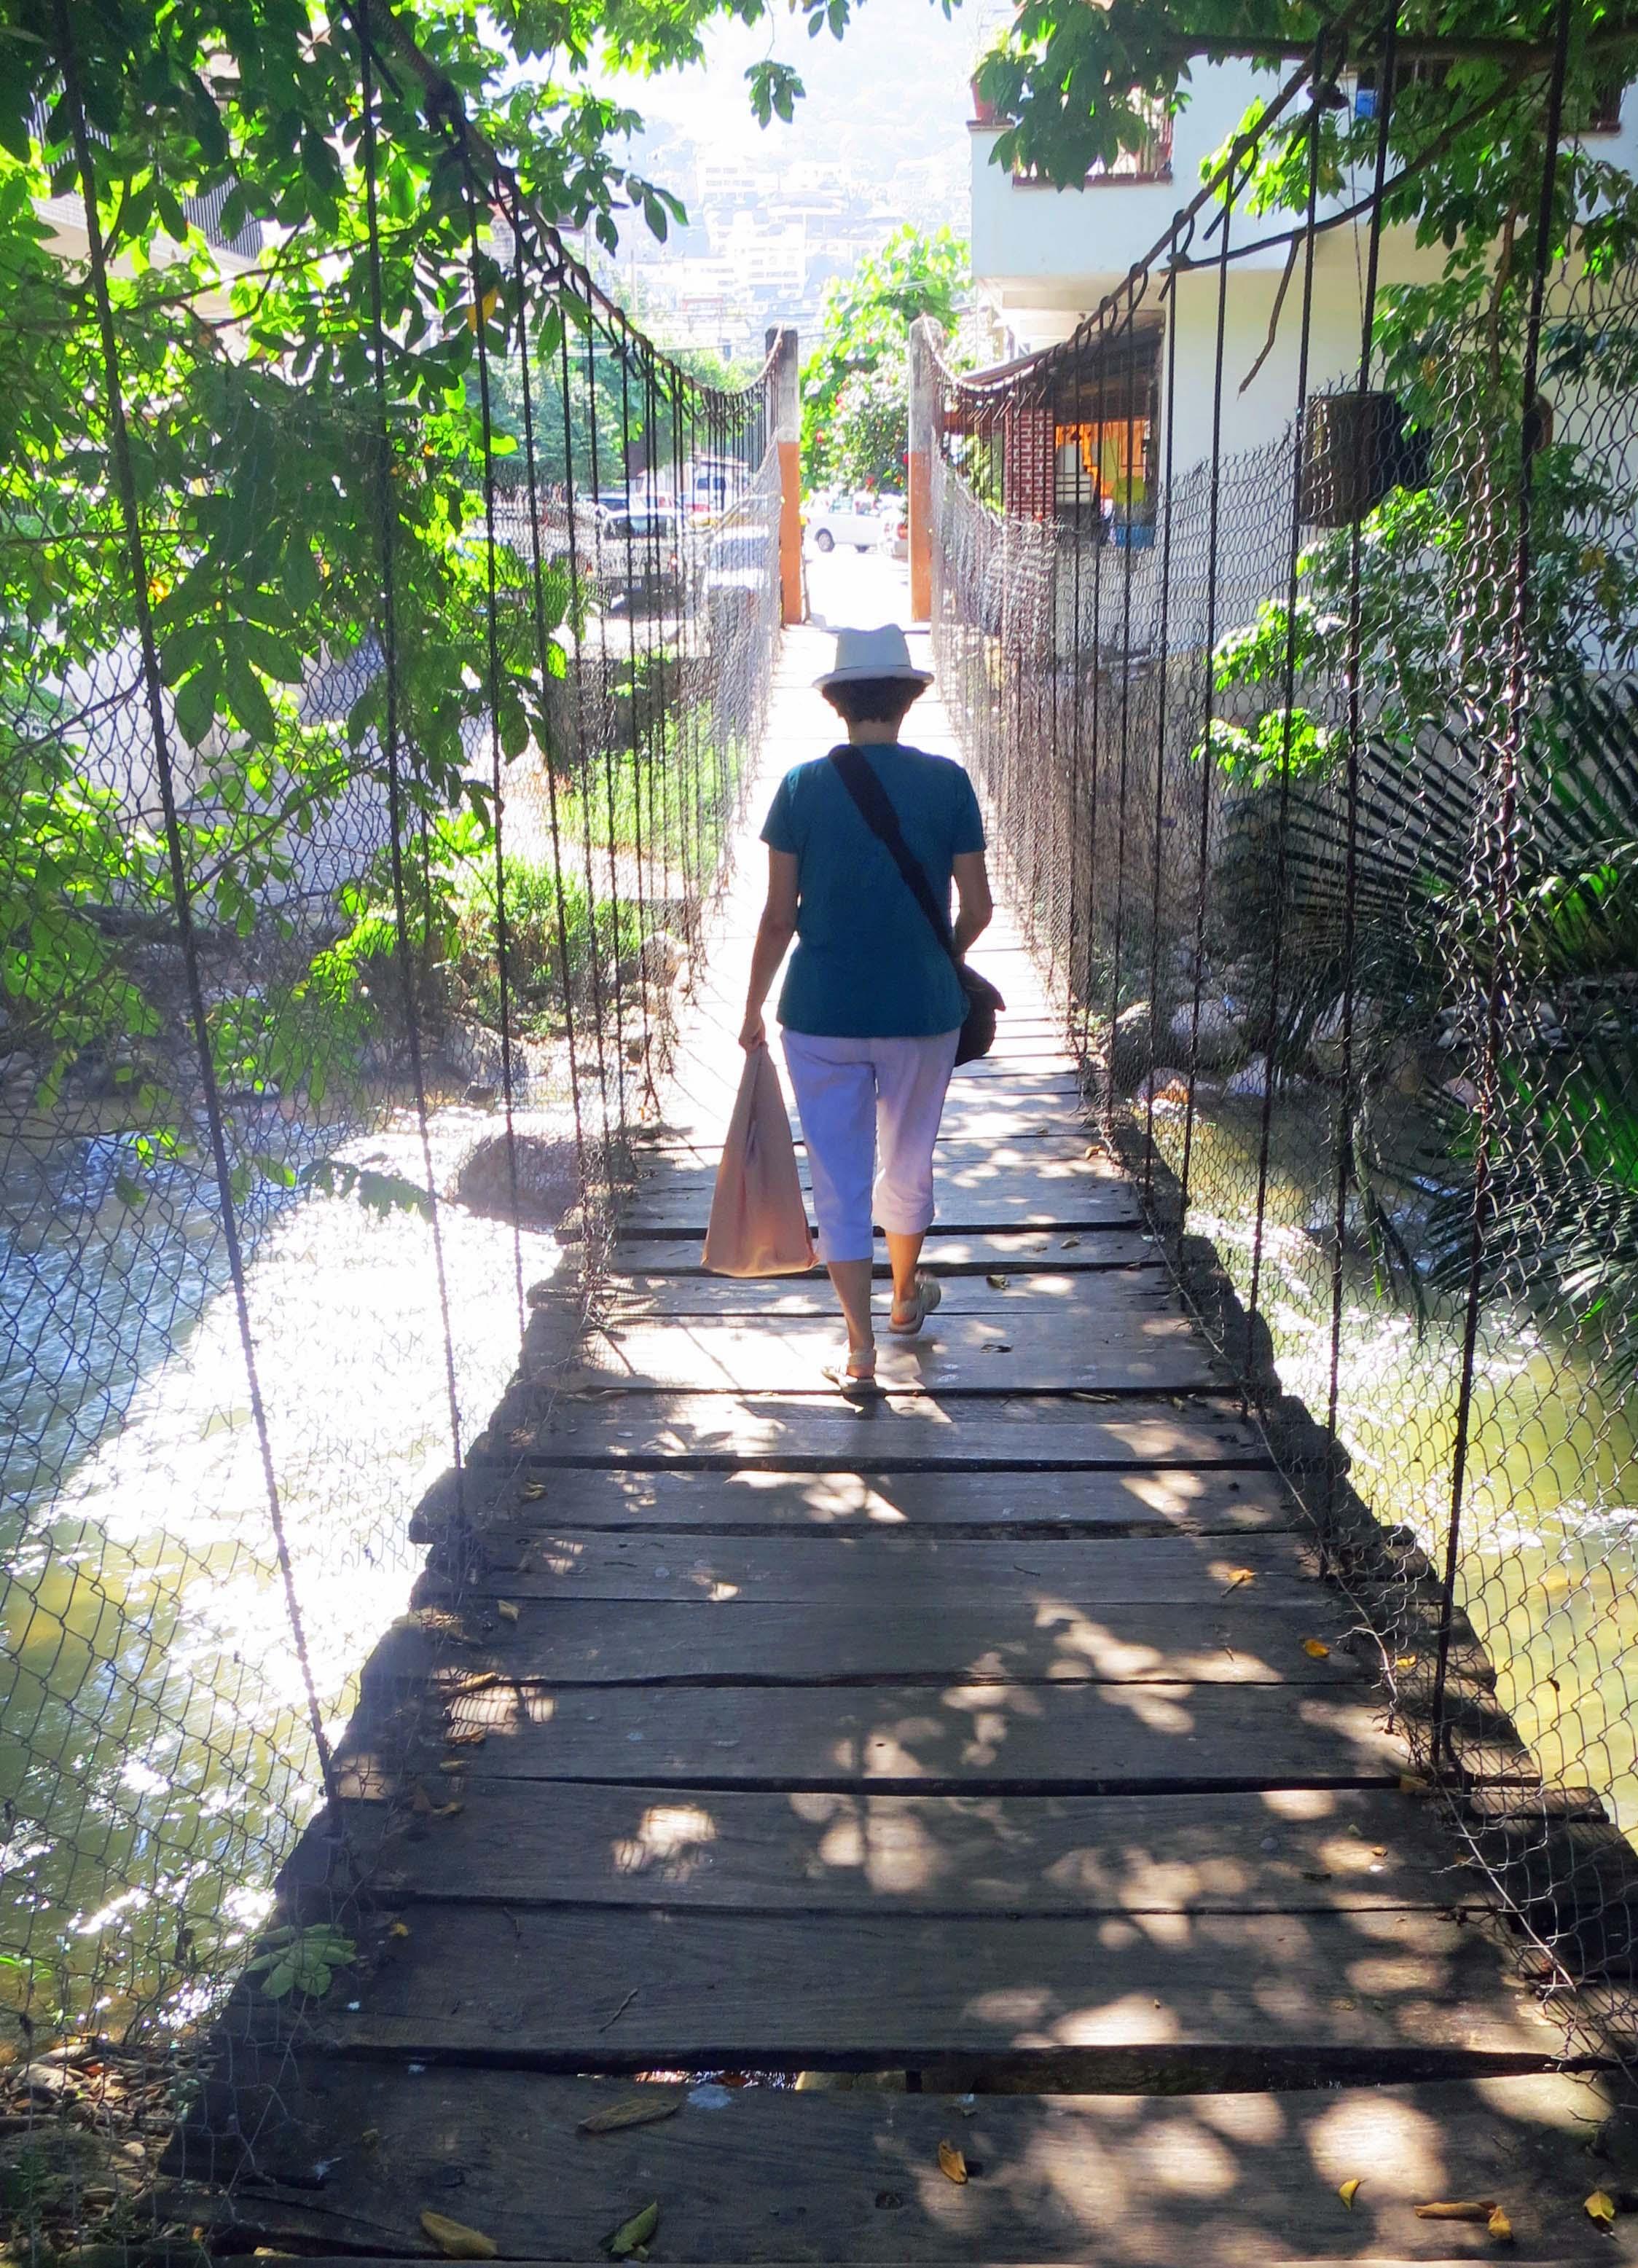 Puerto Vallarta's swinging bridge. Photo by Curtis Mekemson.